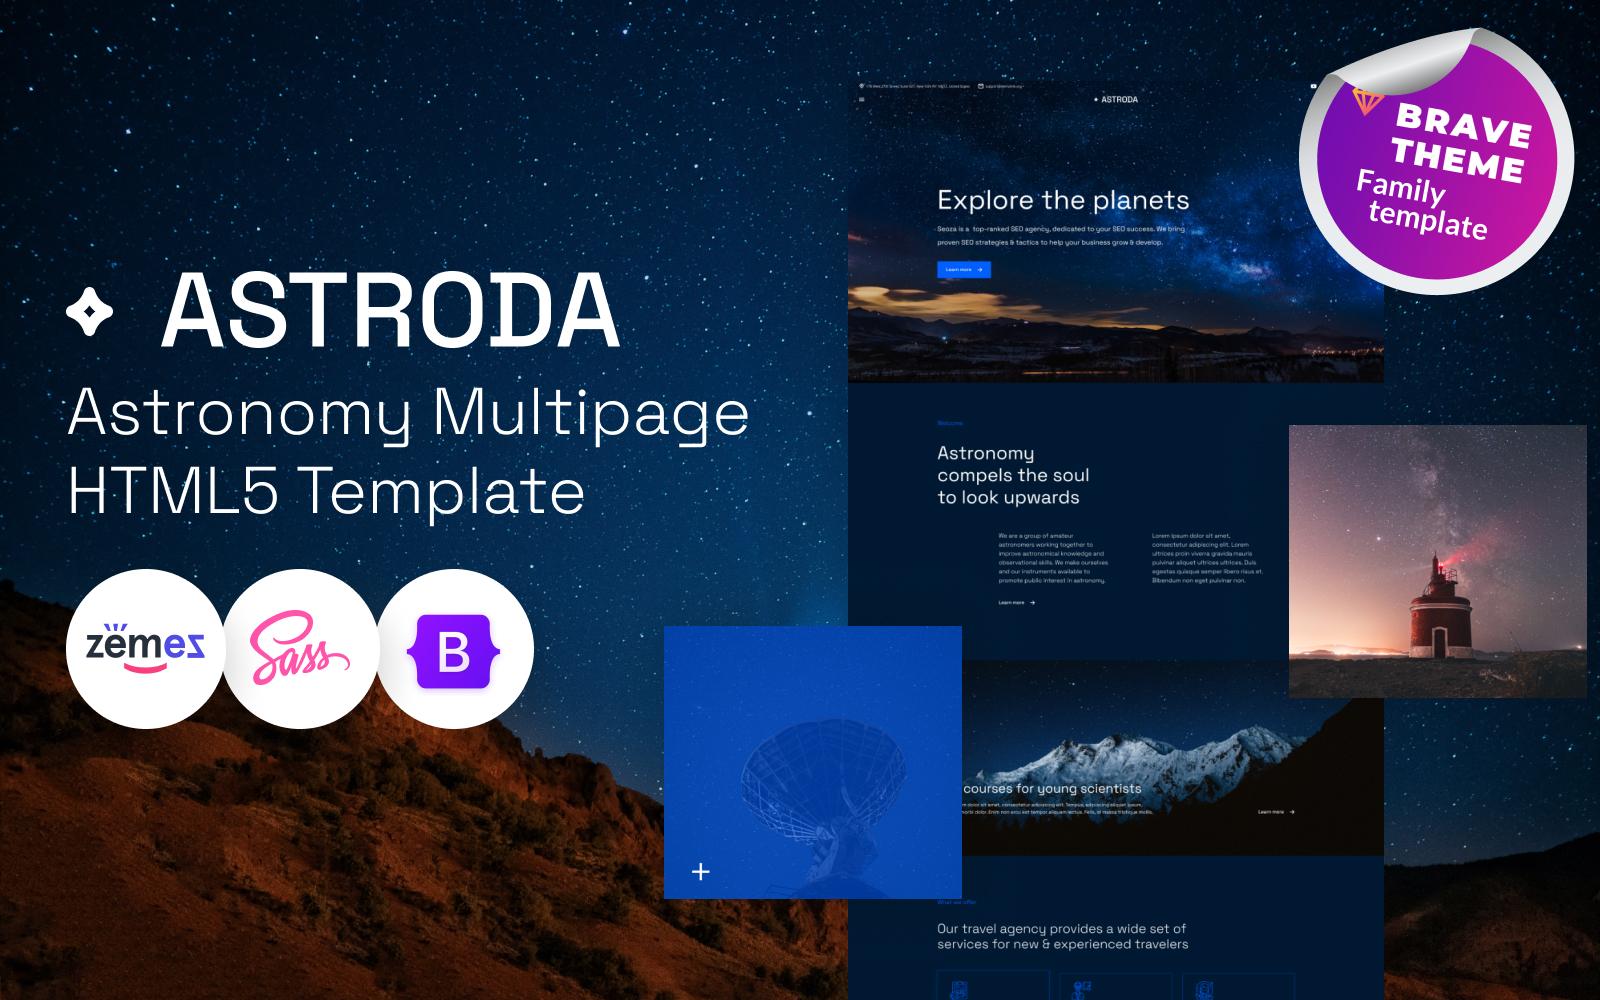 Astroda - Astronomy HTML5 Template